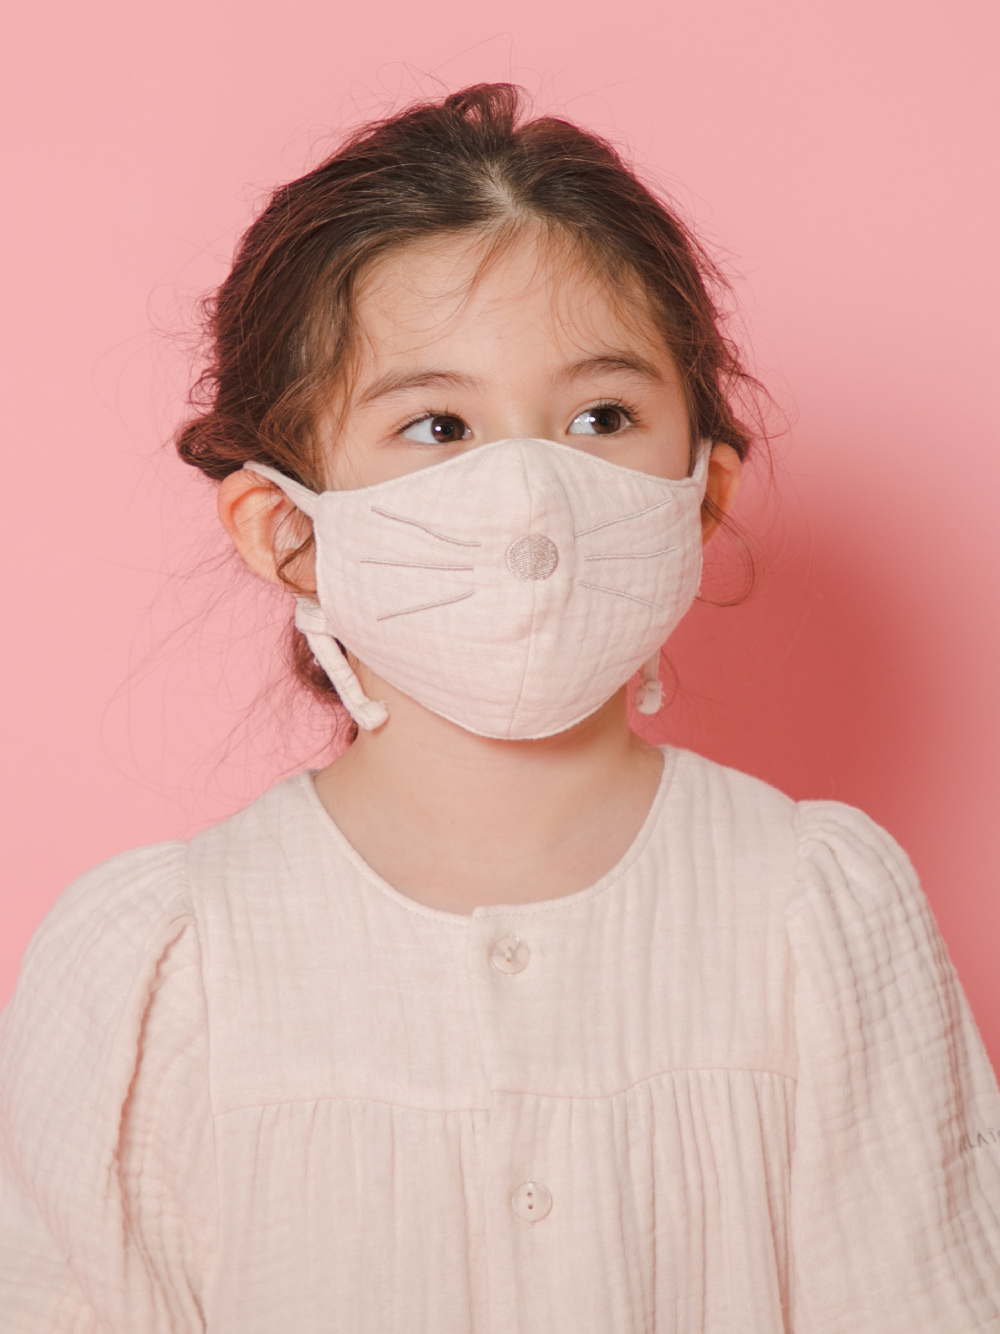 【KIDS】アニマルガーゼ kids マスク | PKGG211755